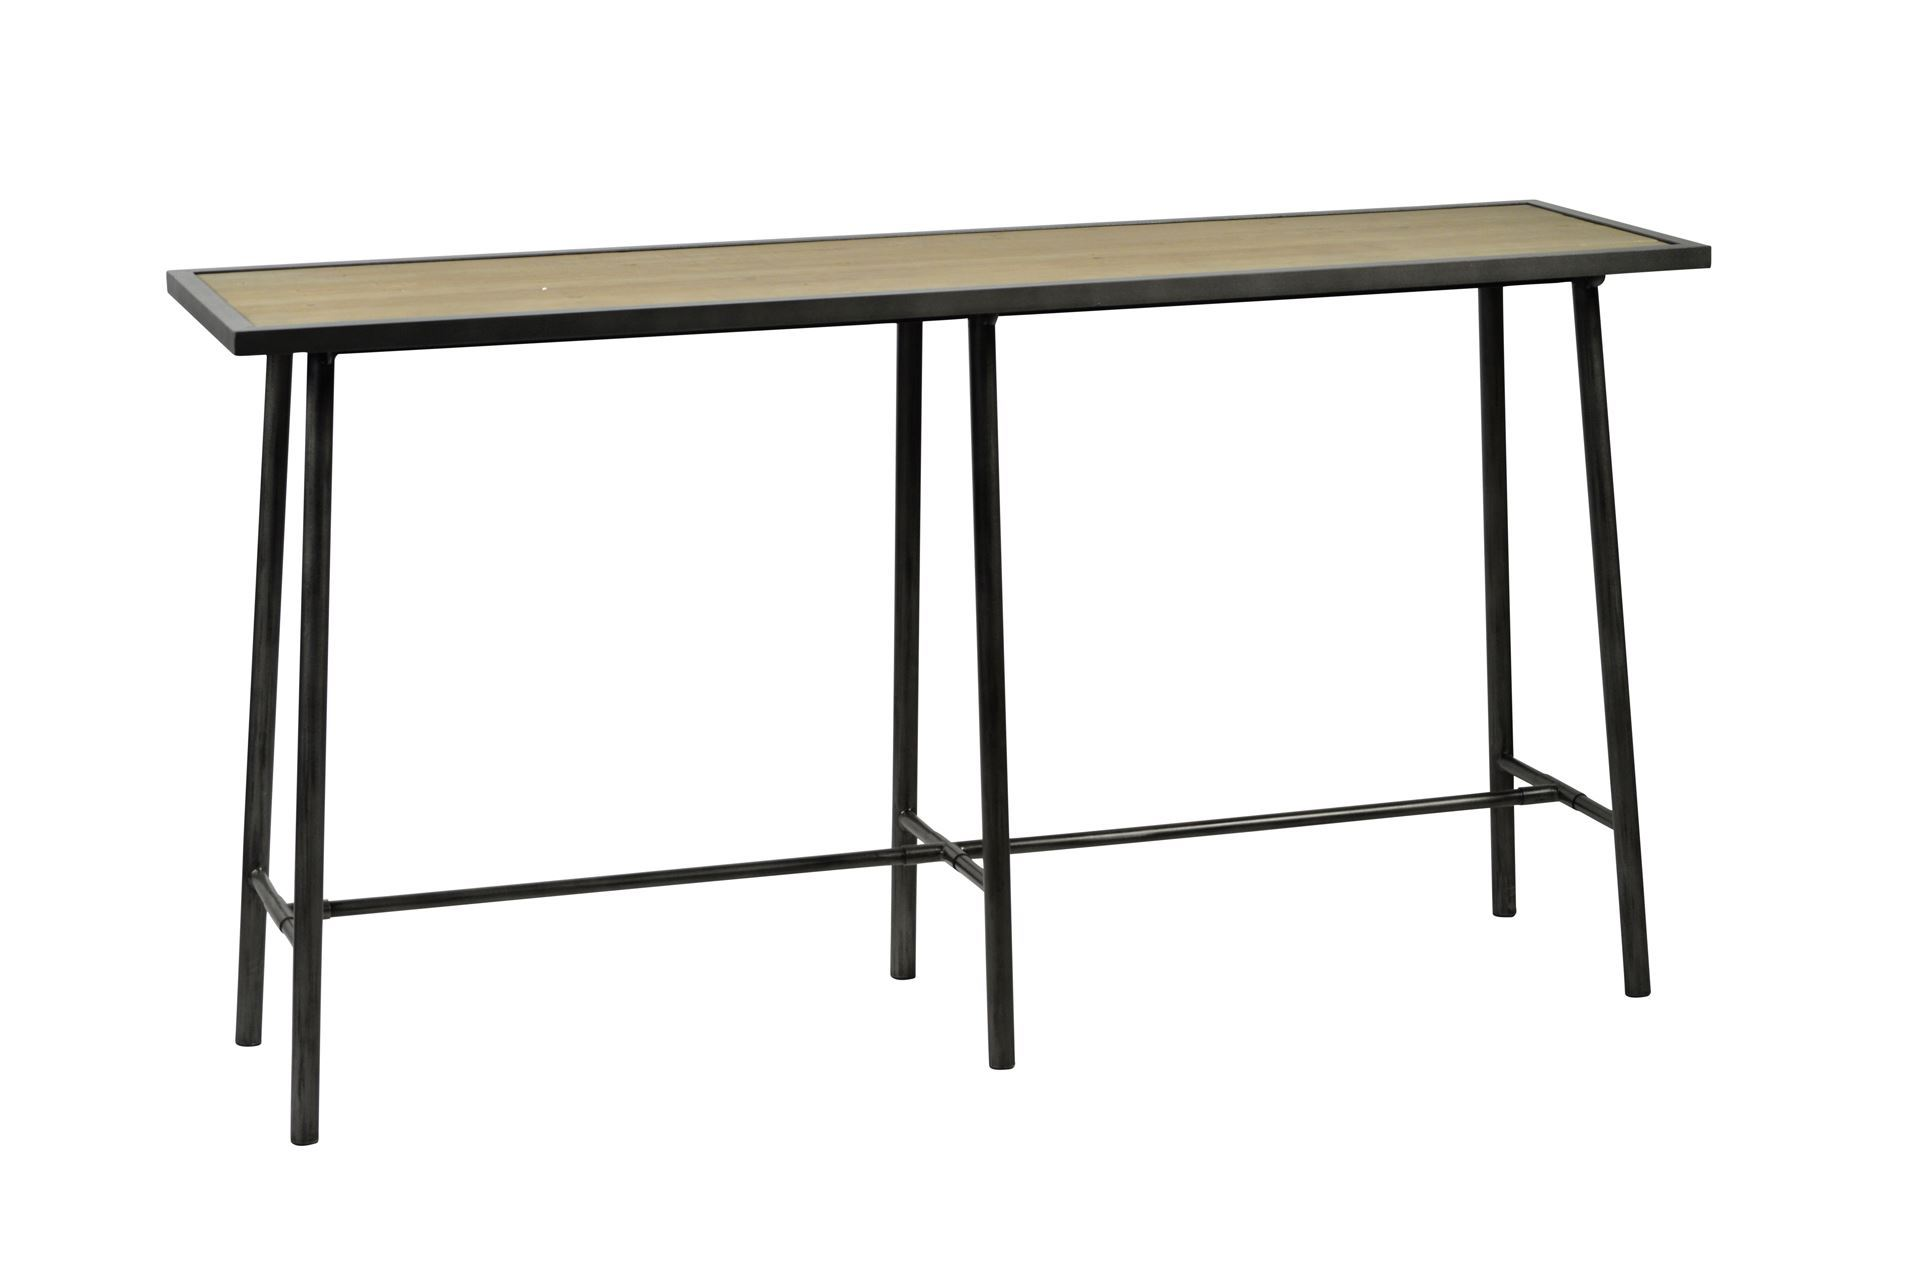 Otb reclaimed pine steel sofa table living spaces for Living spaces sofa table